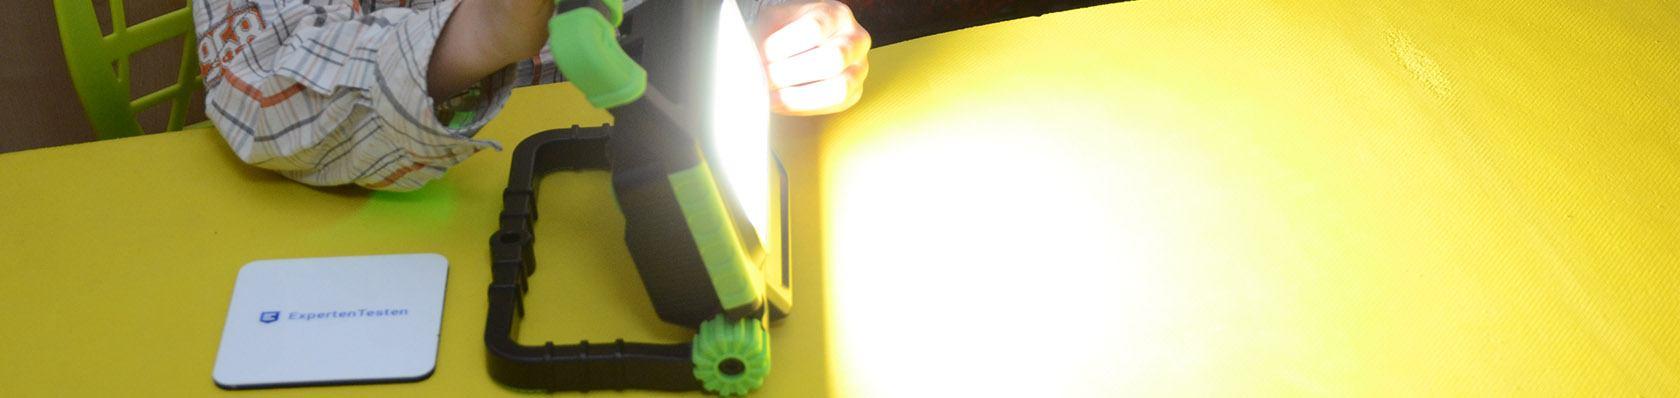 Senter LED im Test auf ExpertenTesten.de